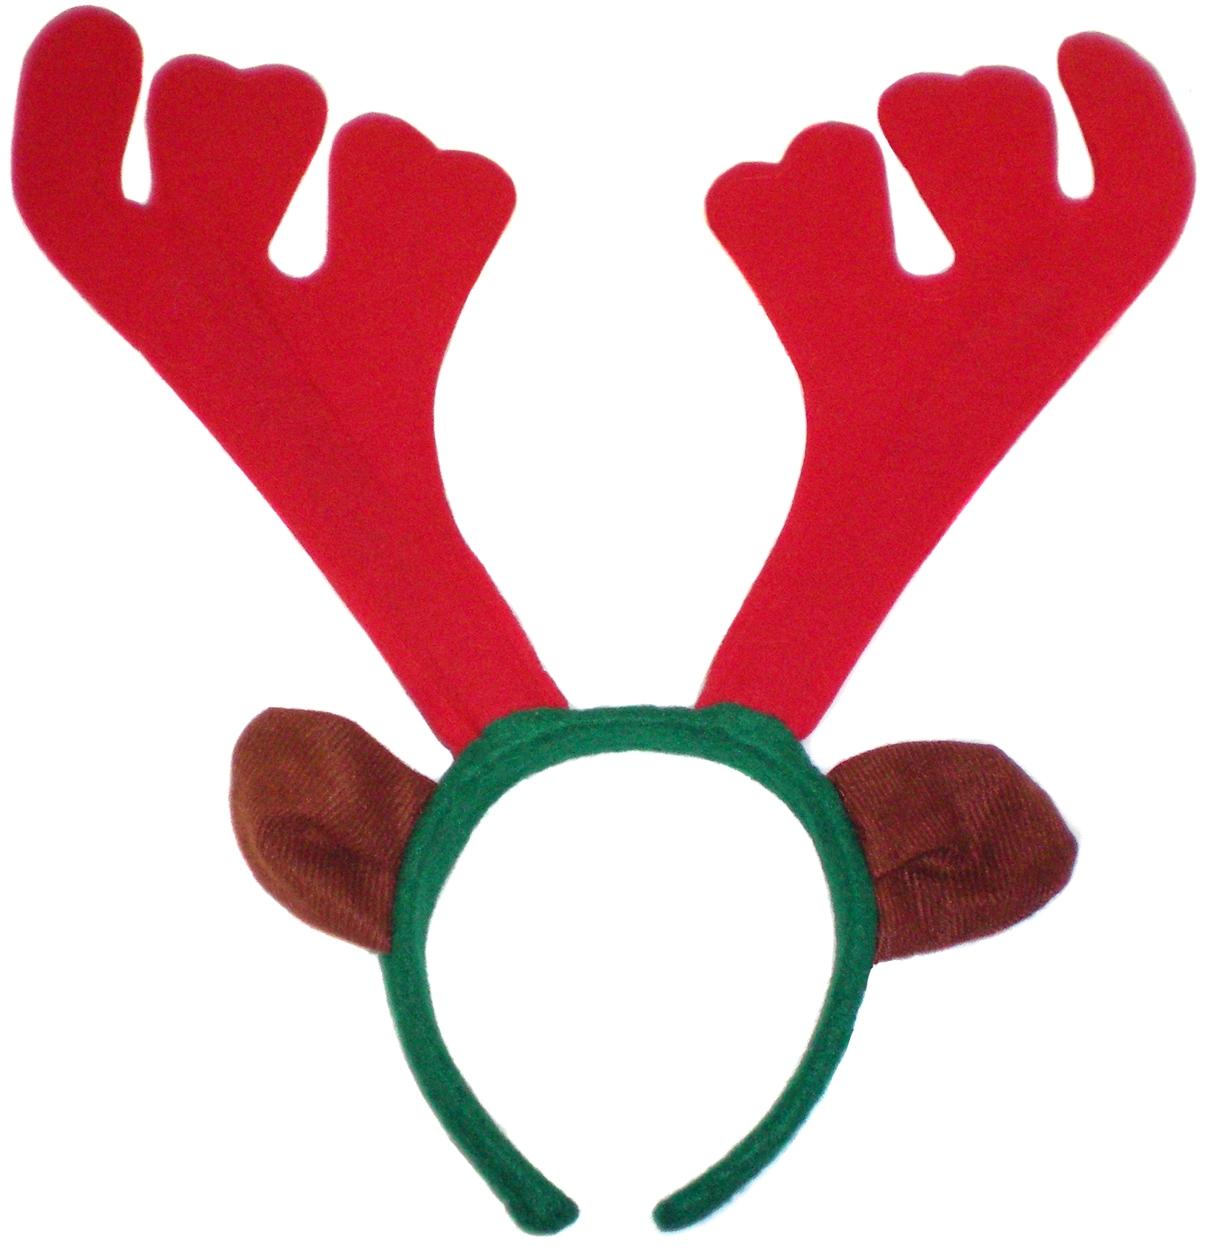 Headband clipart reindeer antler The  Pabich: by random